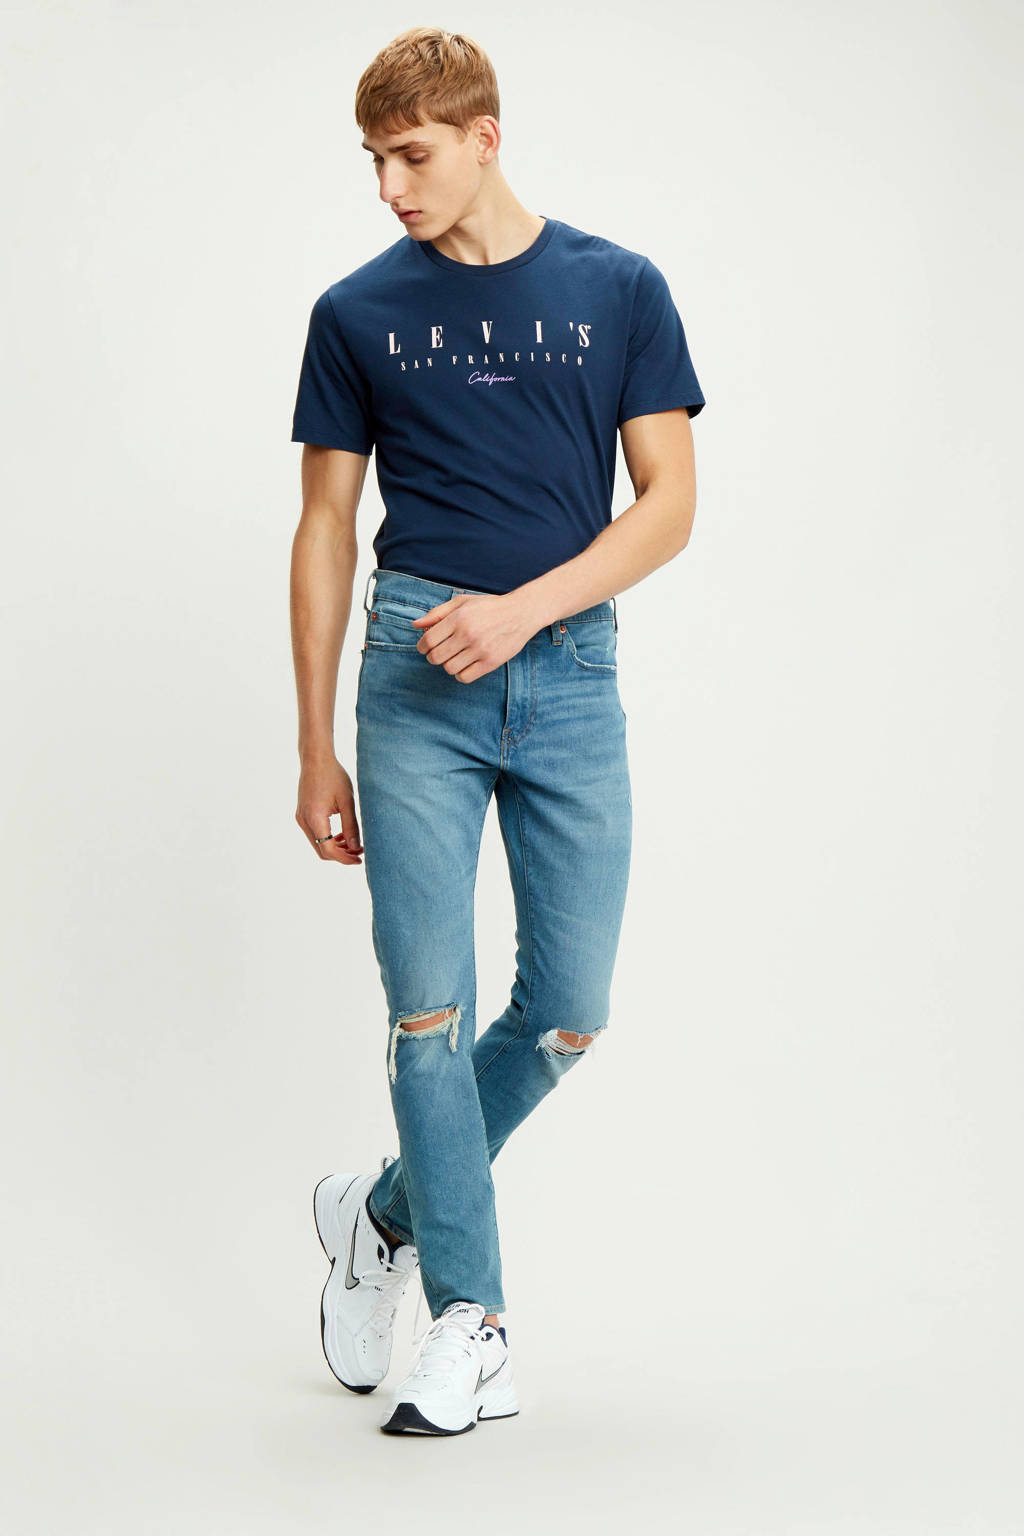 Levi's T-shirt met tekst donkerblauw, Donkerblauw